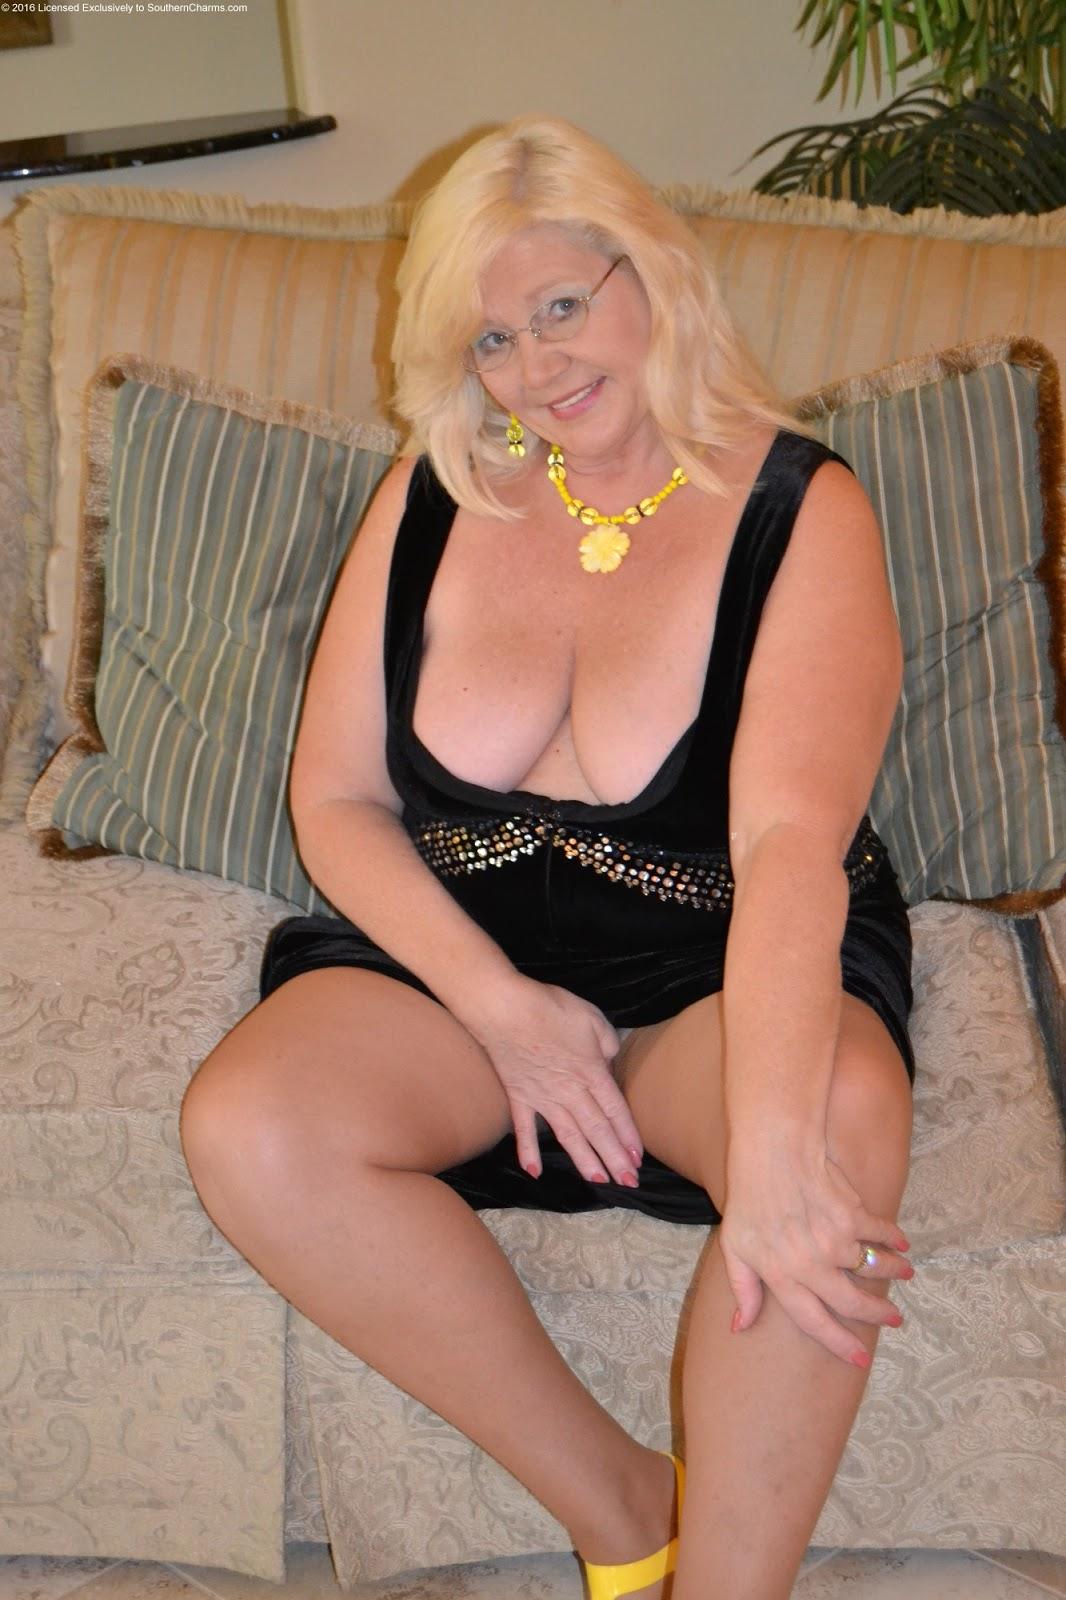 Nude Curvy Older Women